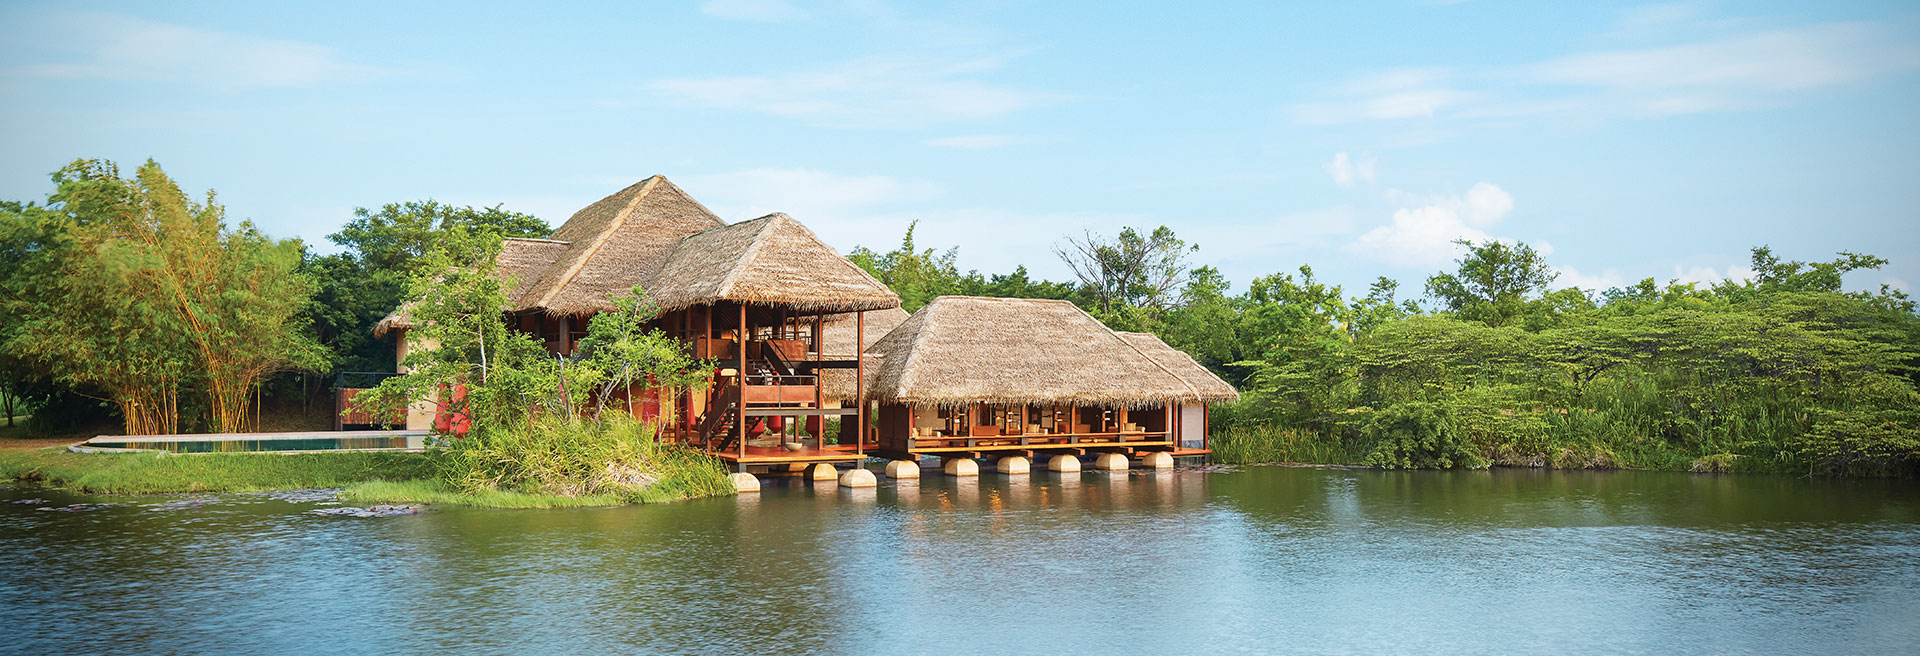 Sigiriya Hotel Experiences